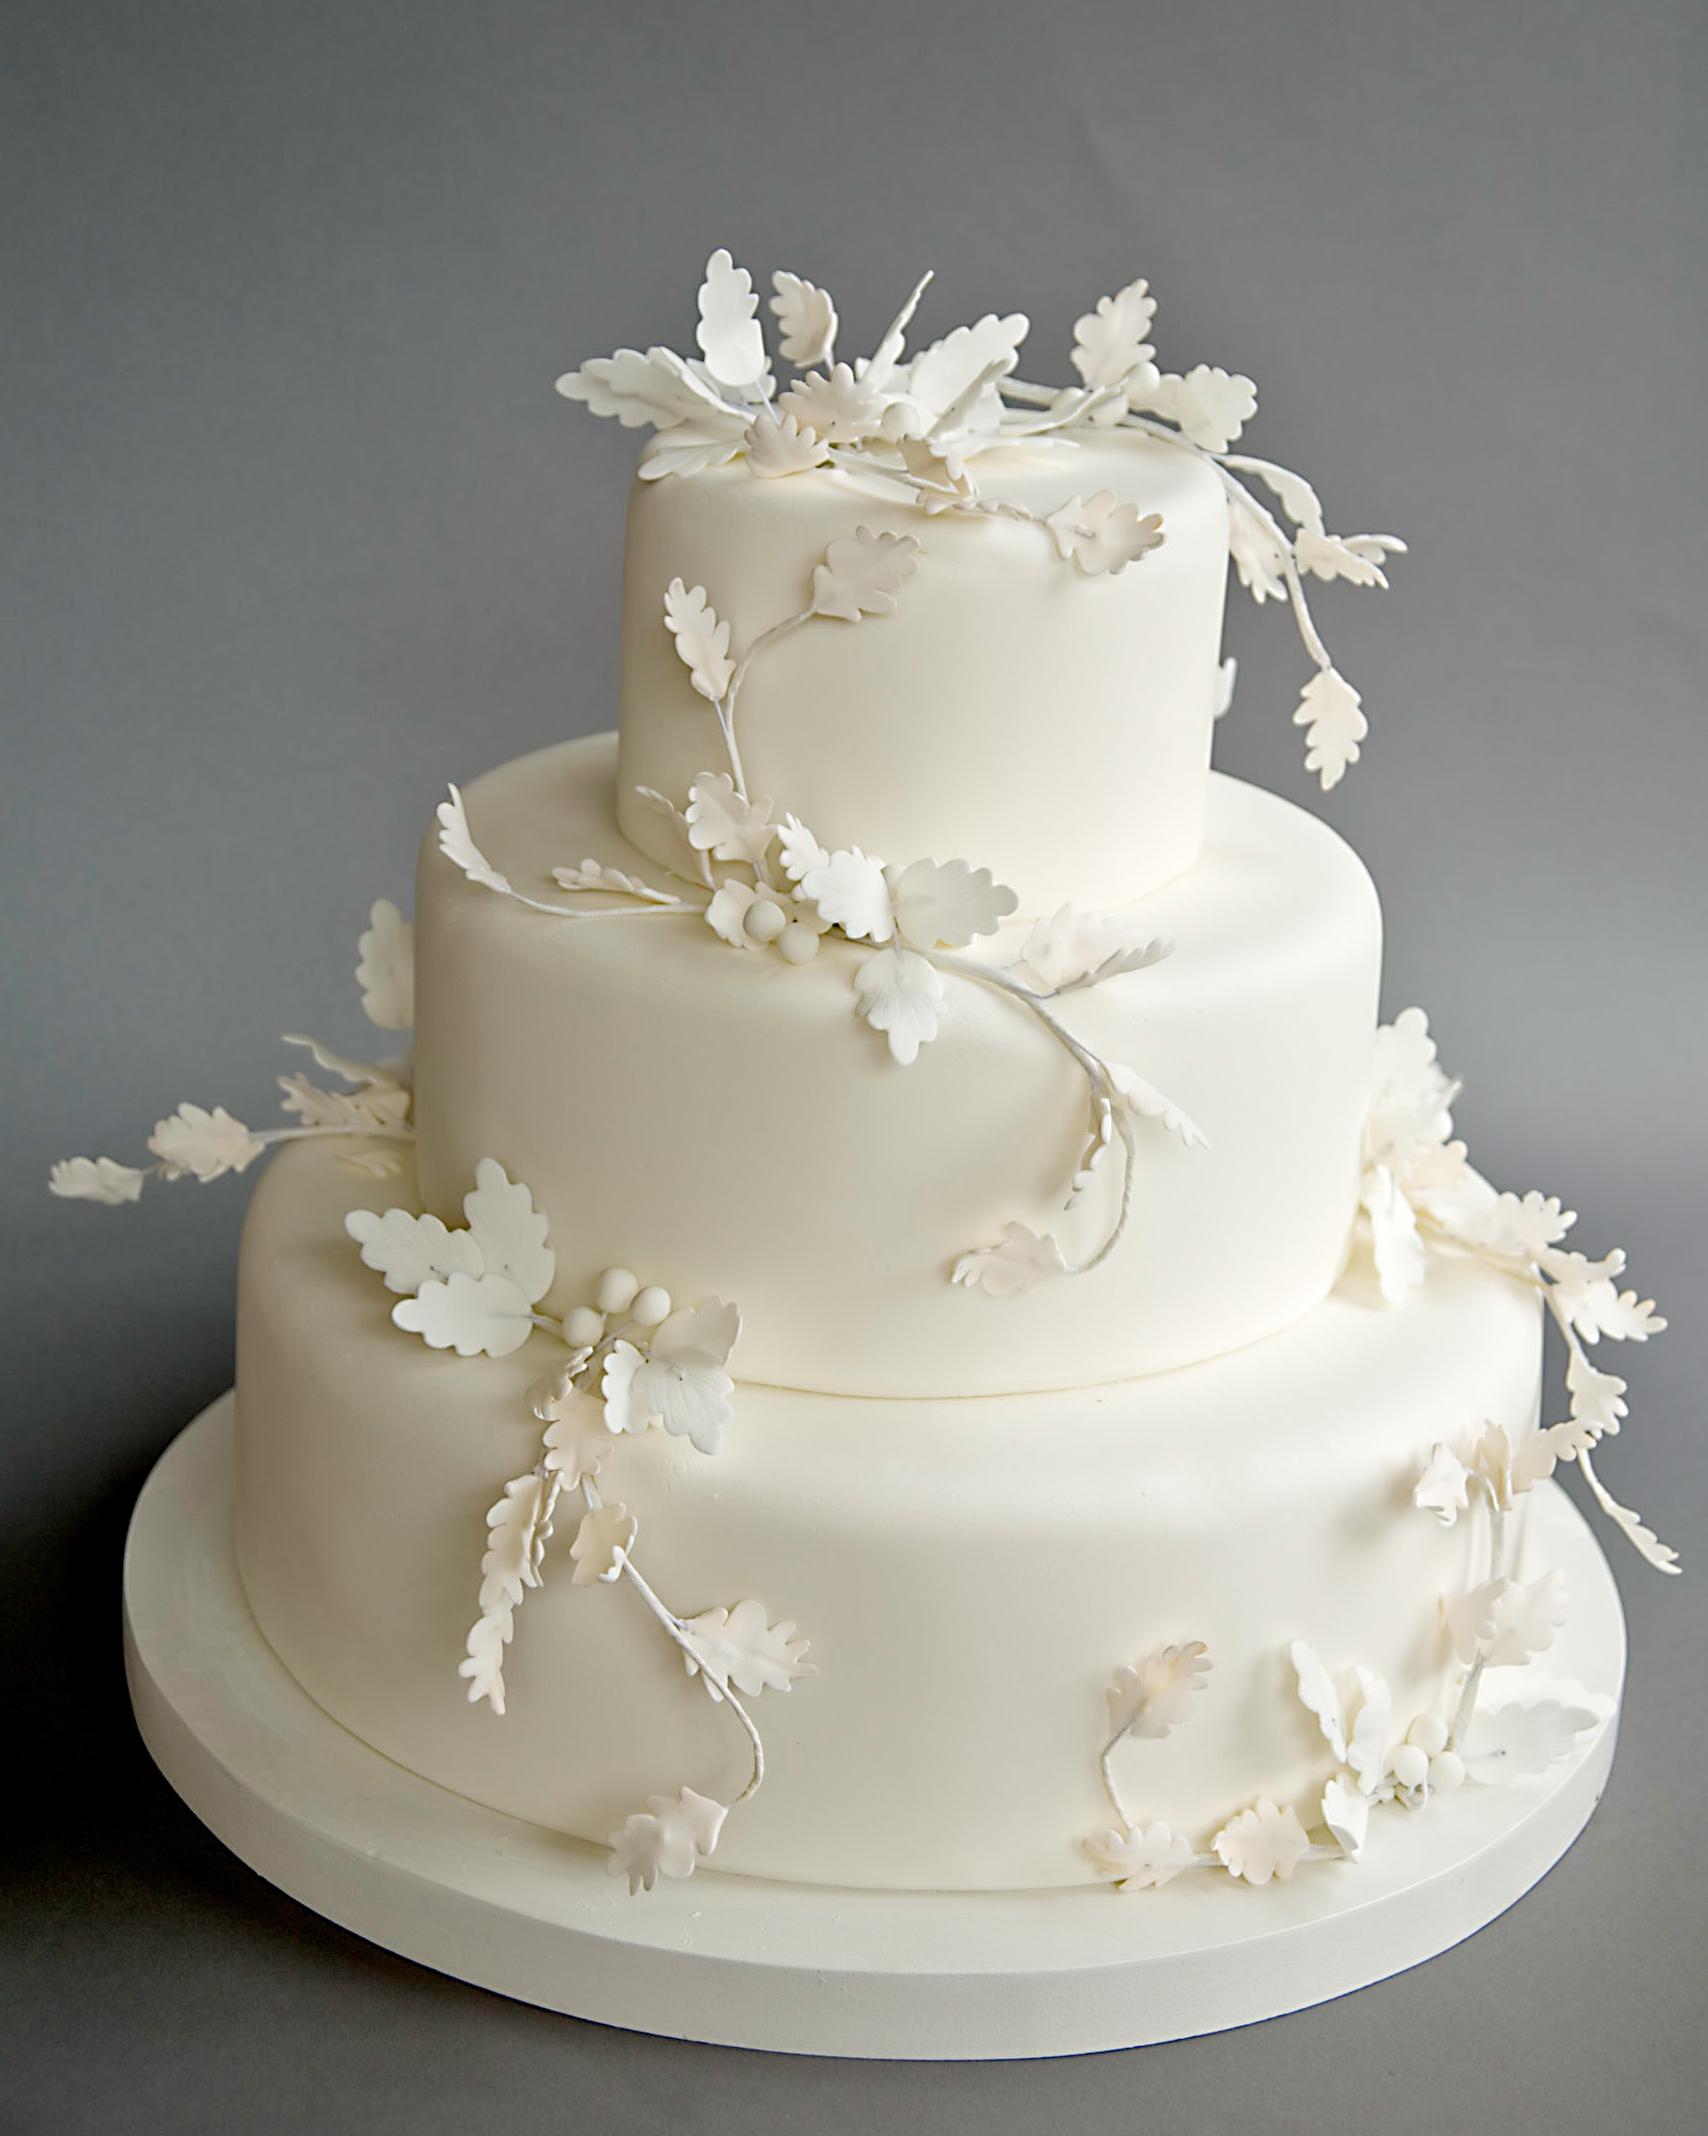 cake-pros-awhitecake-0414.jpg